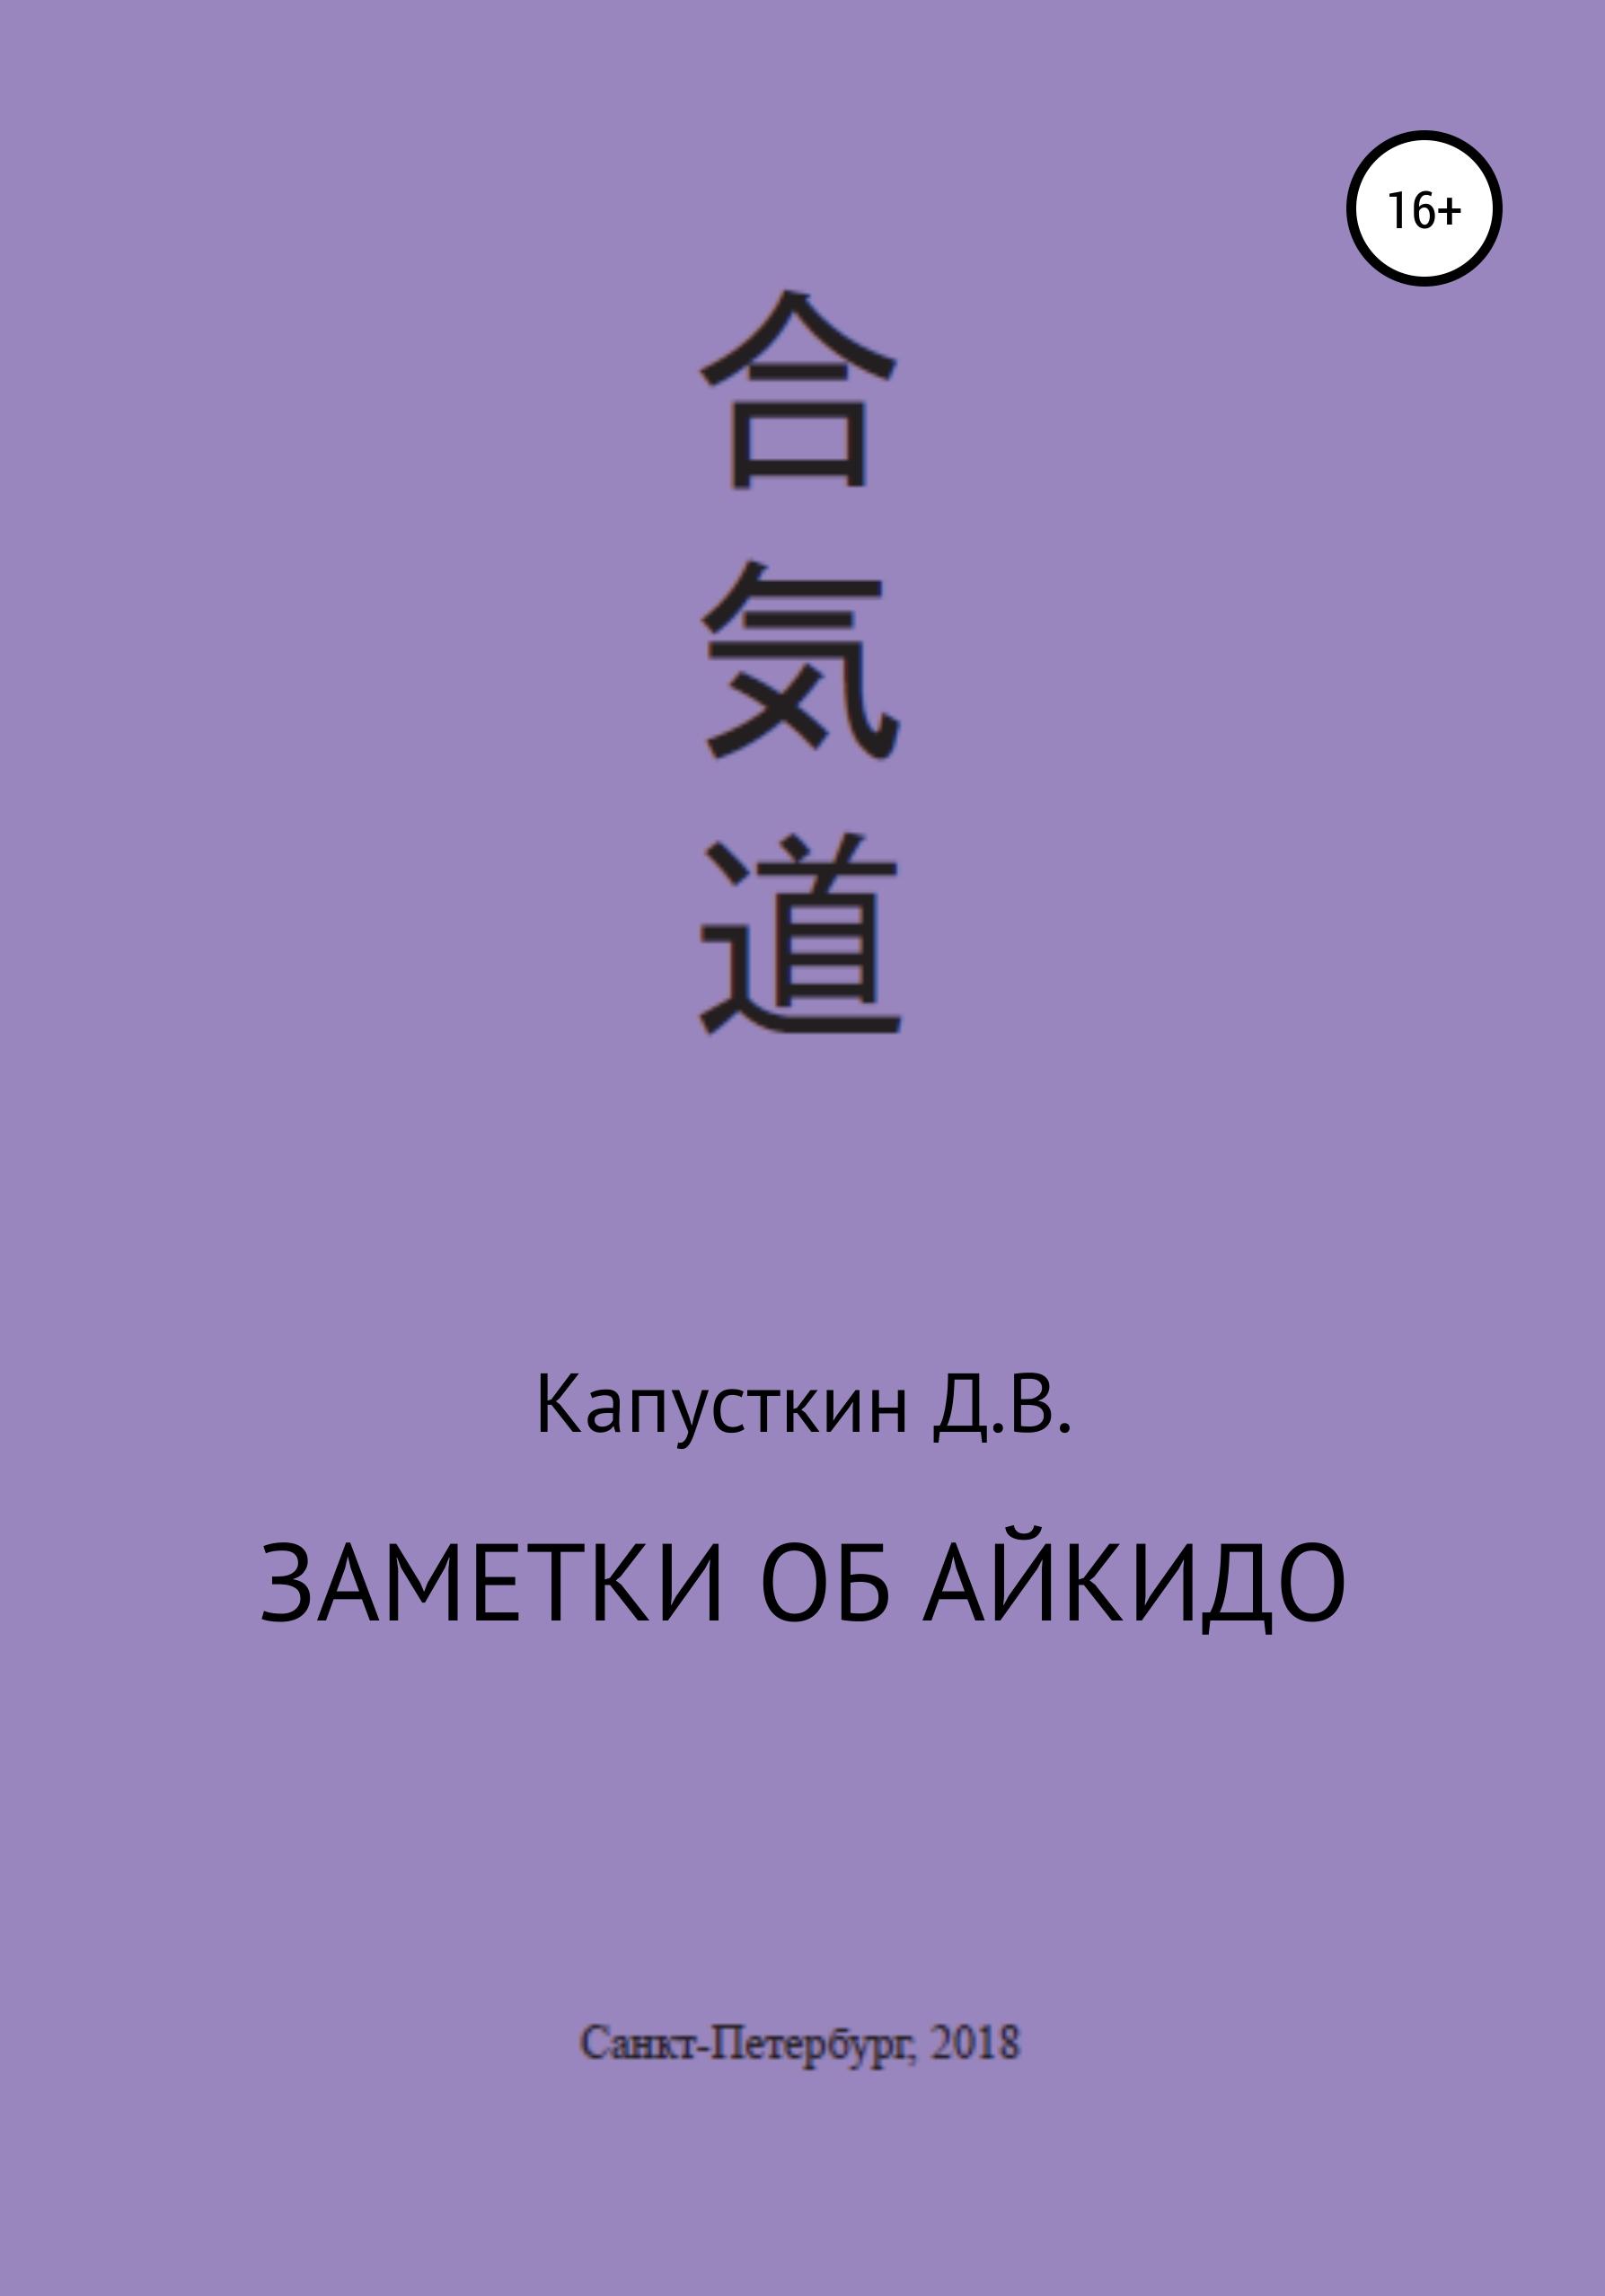 Данила Васильевич Капусткин Заметки об айкидо айкидо 1 2 3 3dvd